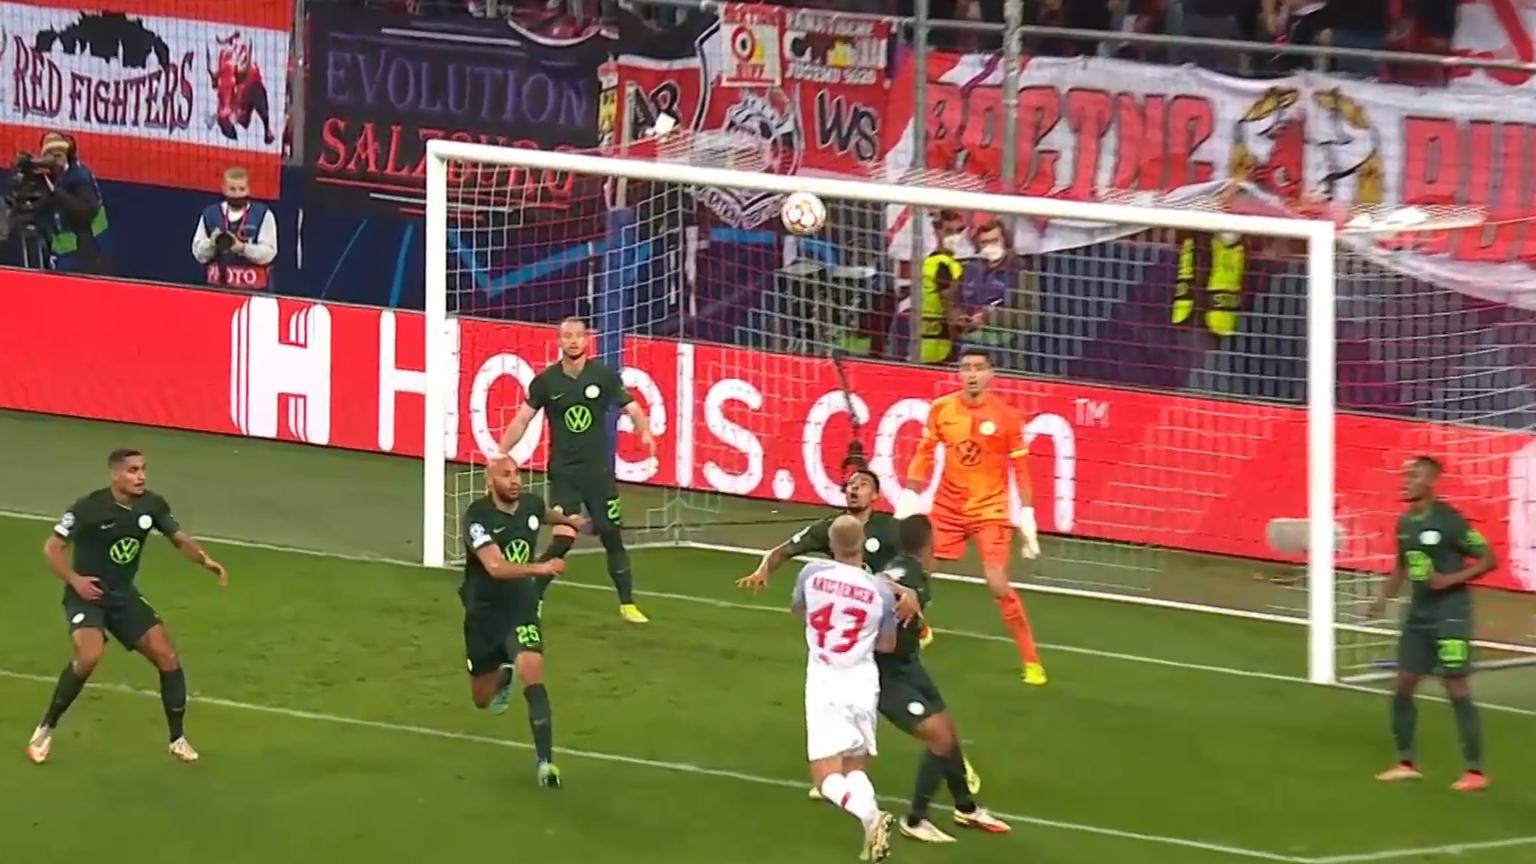 Champions League highlights: RB Salzburg vs Wolfsburg